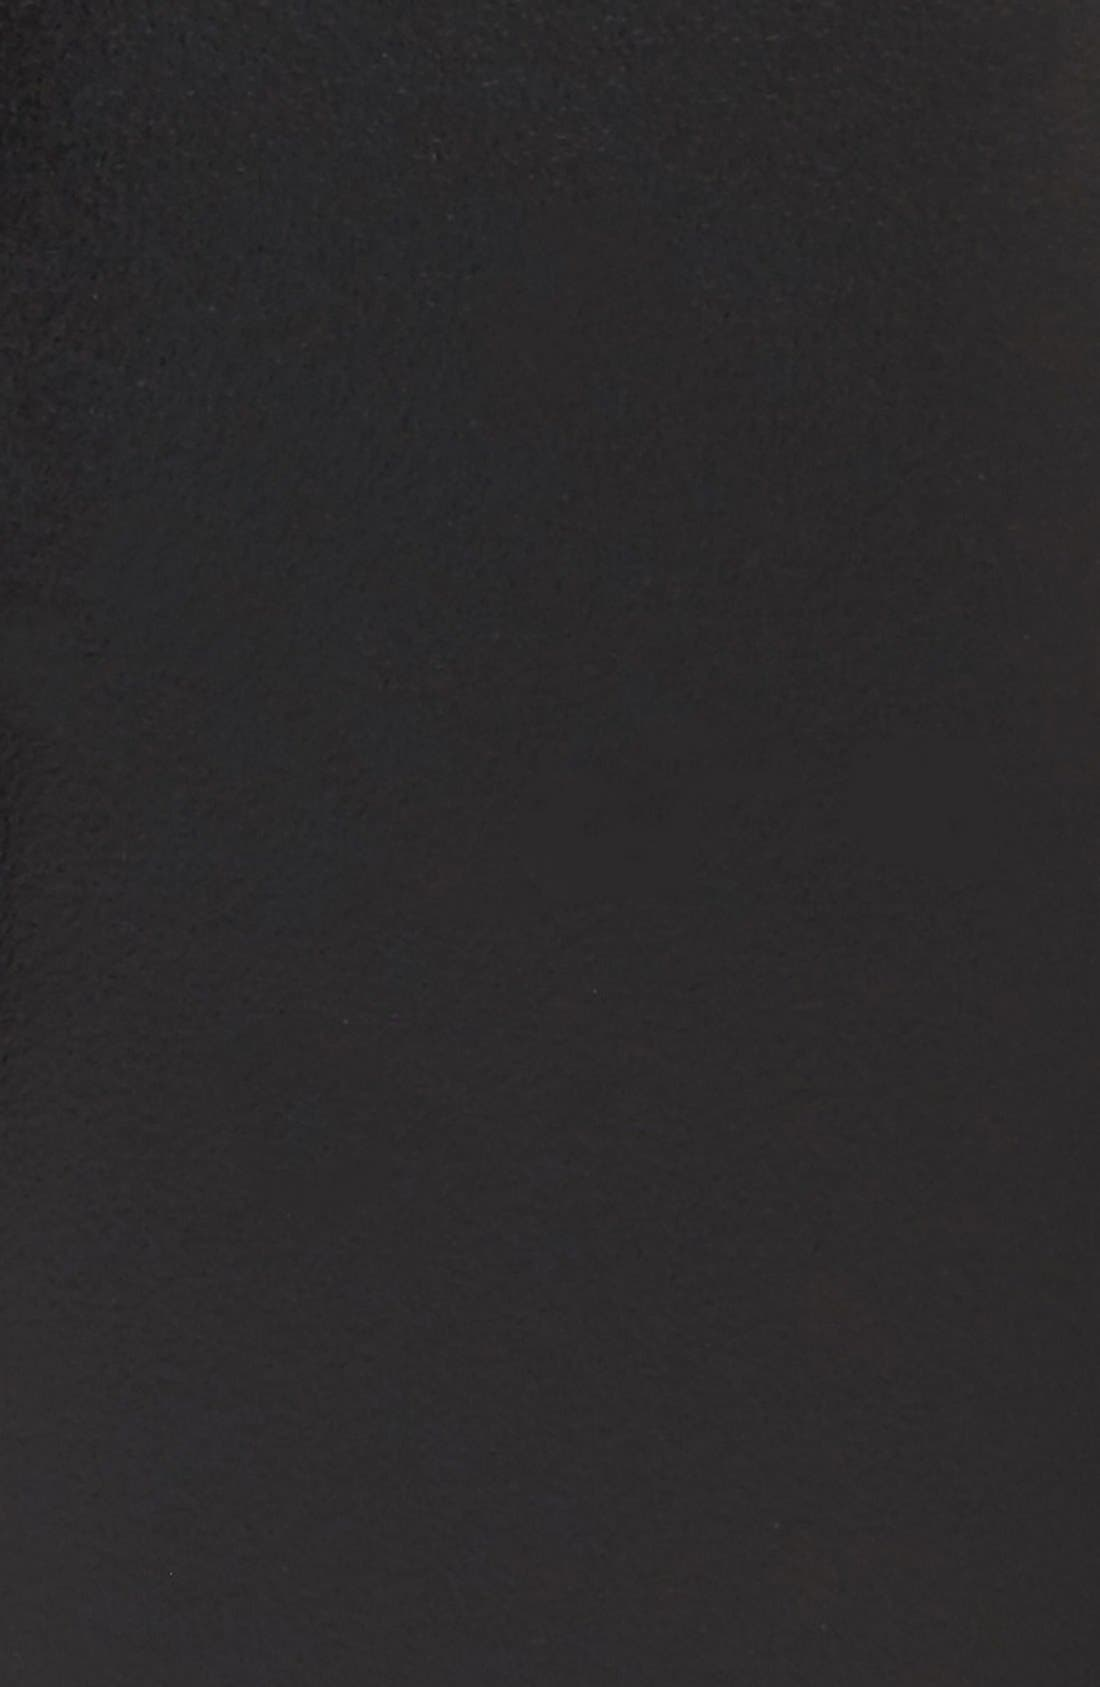 SALVATORE FERRAGAMO, Reversible Leather Belt, Alternate thumbnail 2, color, NERO